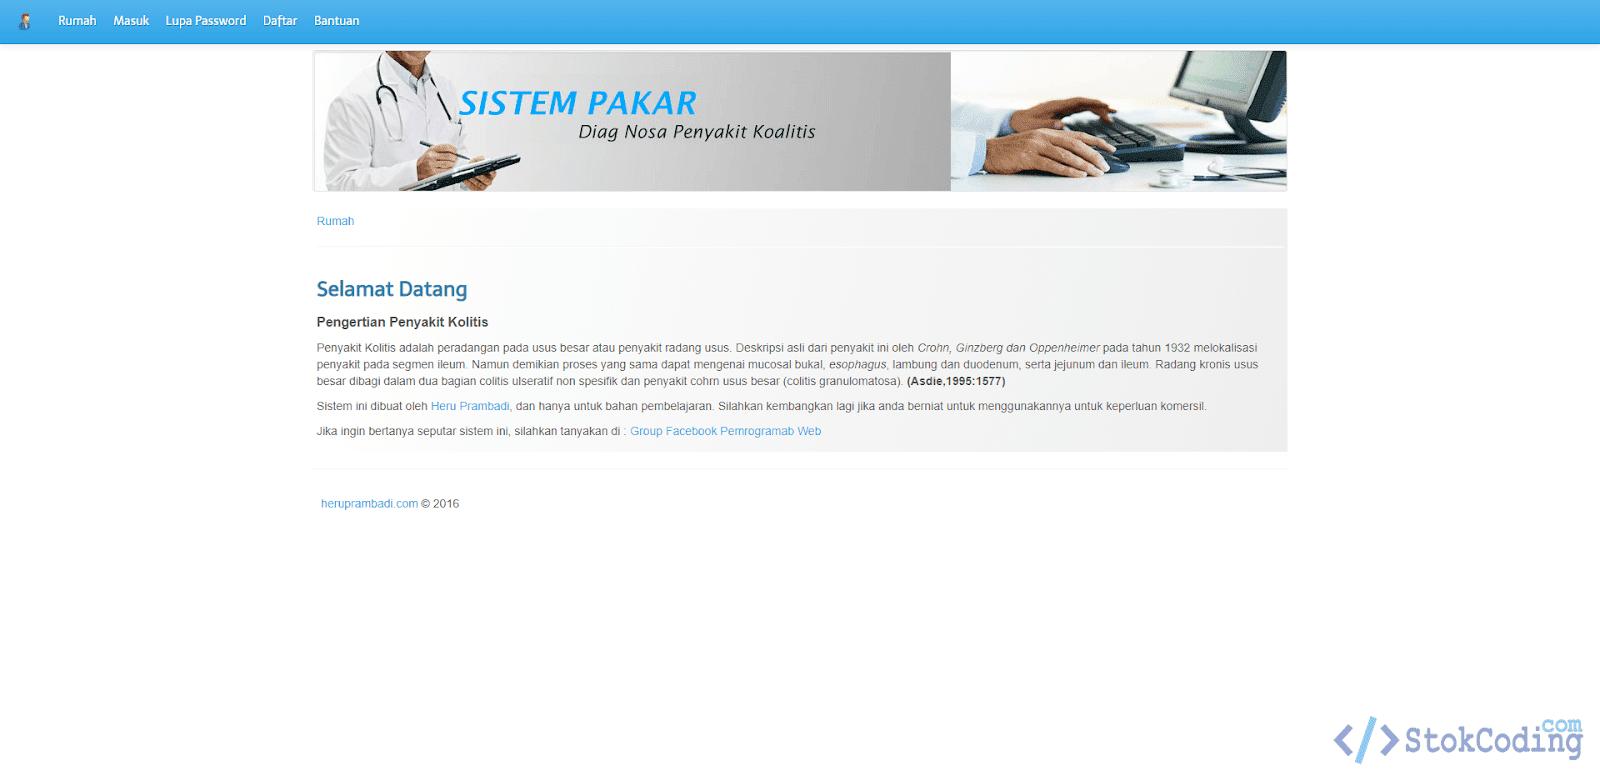 Sistem Pakar Diagnosa Penyakit Koalitis (Codeigniter)